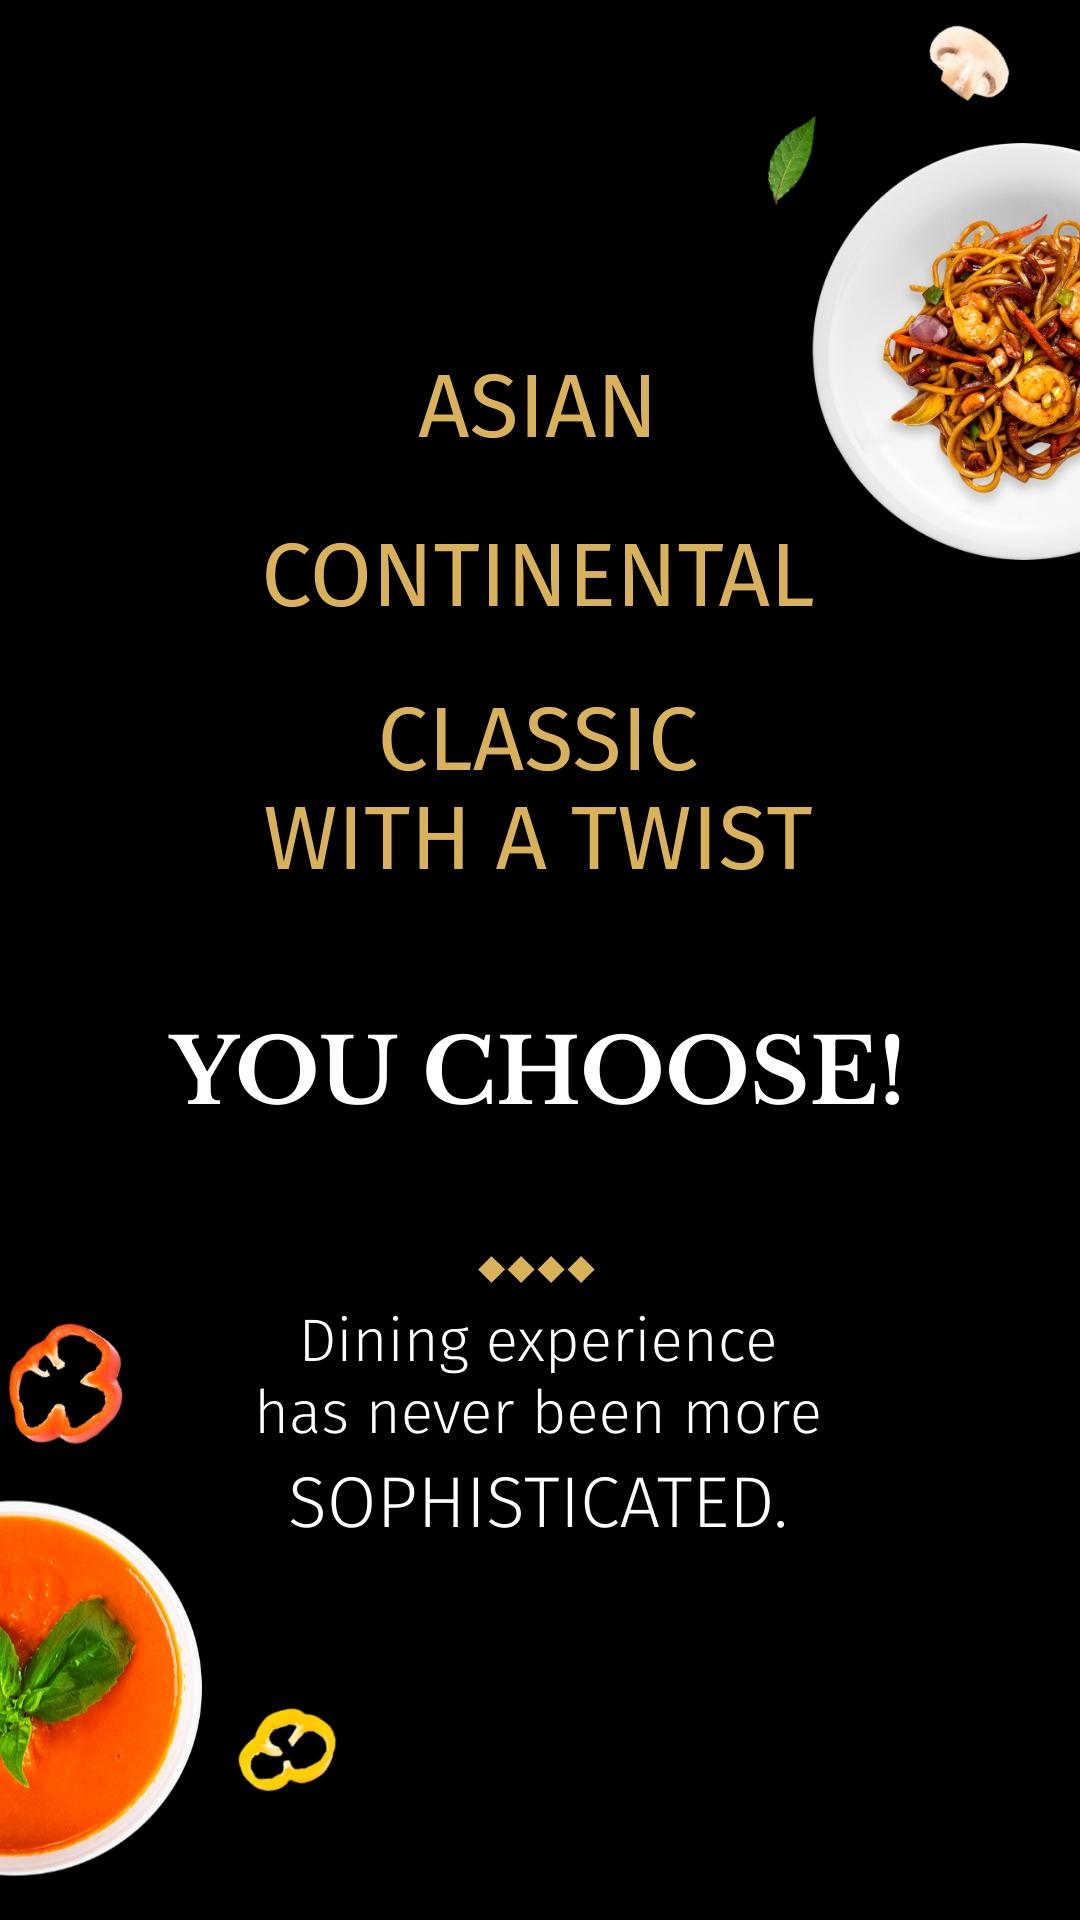 New Restaurant - Instagram Video Ad Template